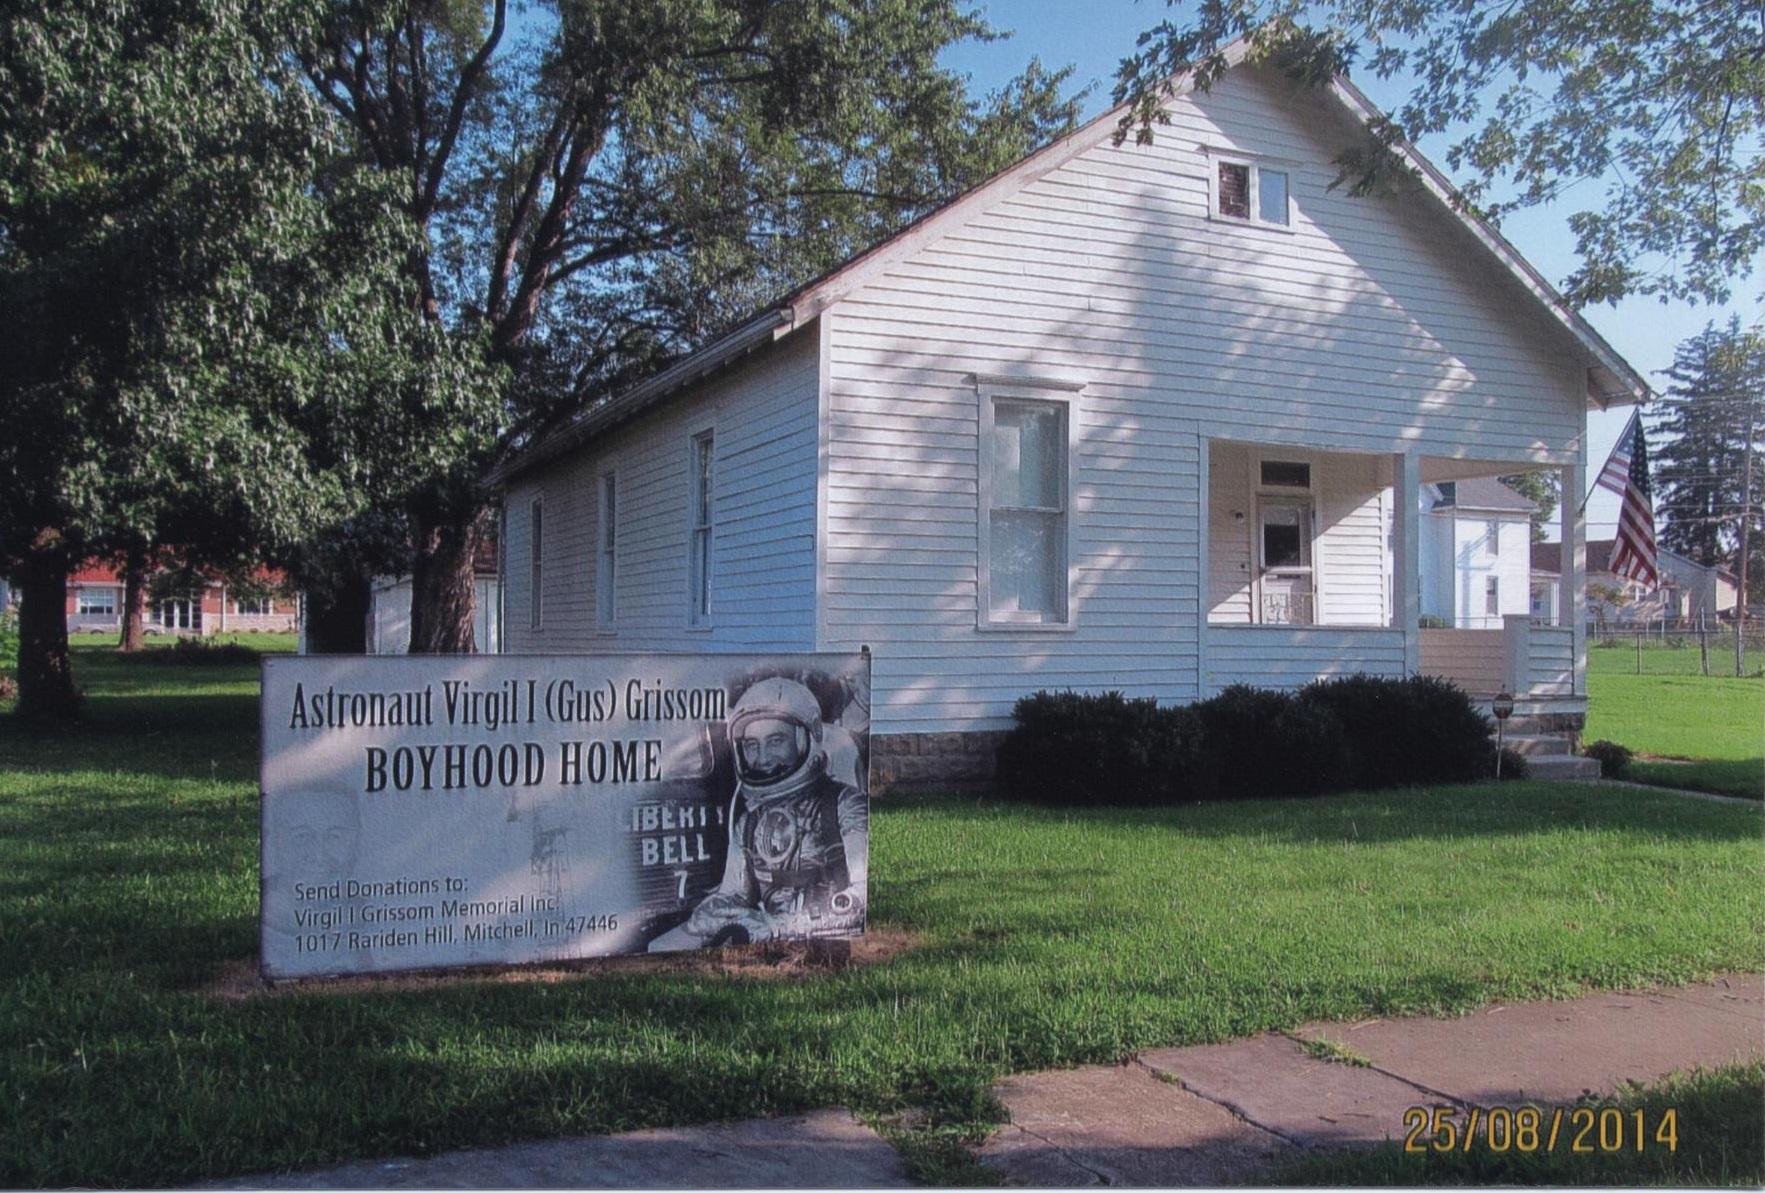 Gus Grissom Boyhood Home